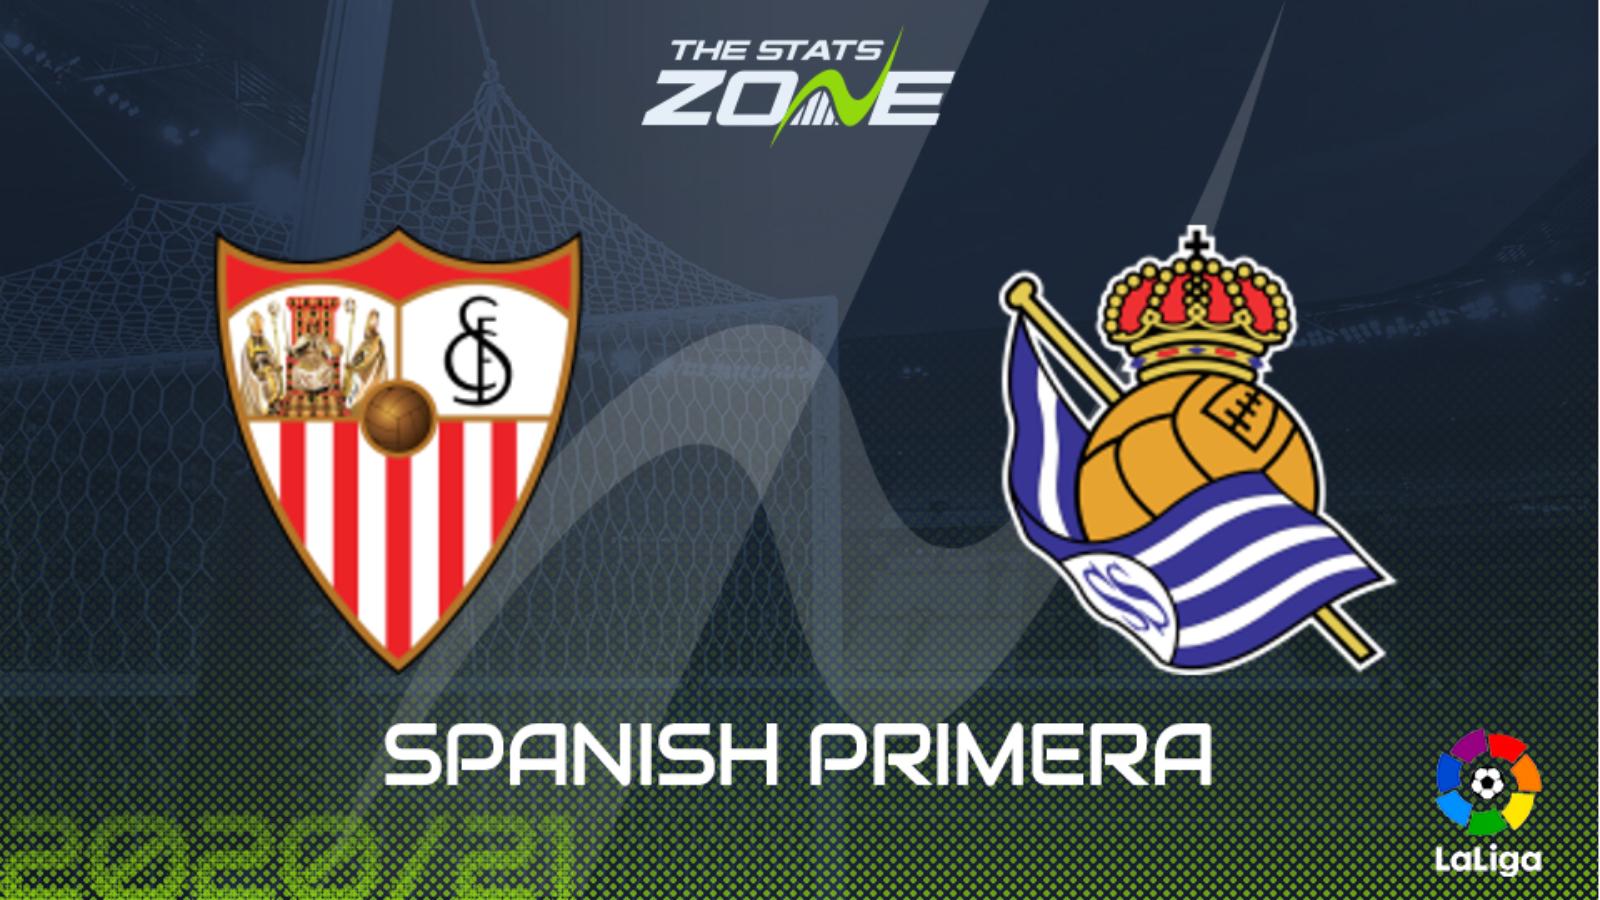 Sevilla v real sociedad betting preview 5 minute binary options trading software